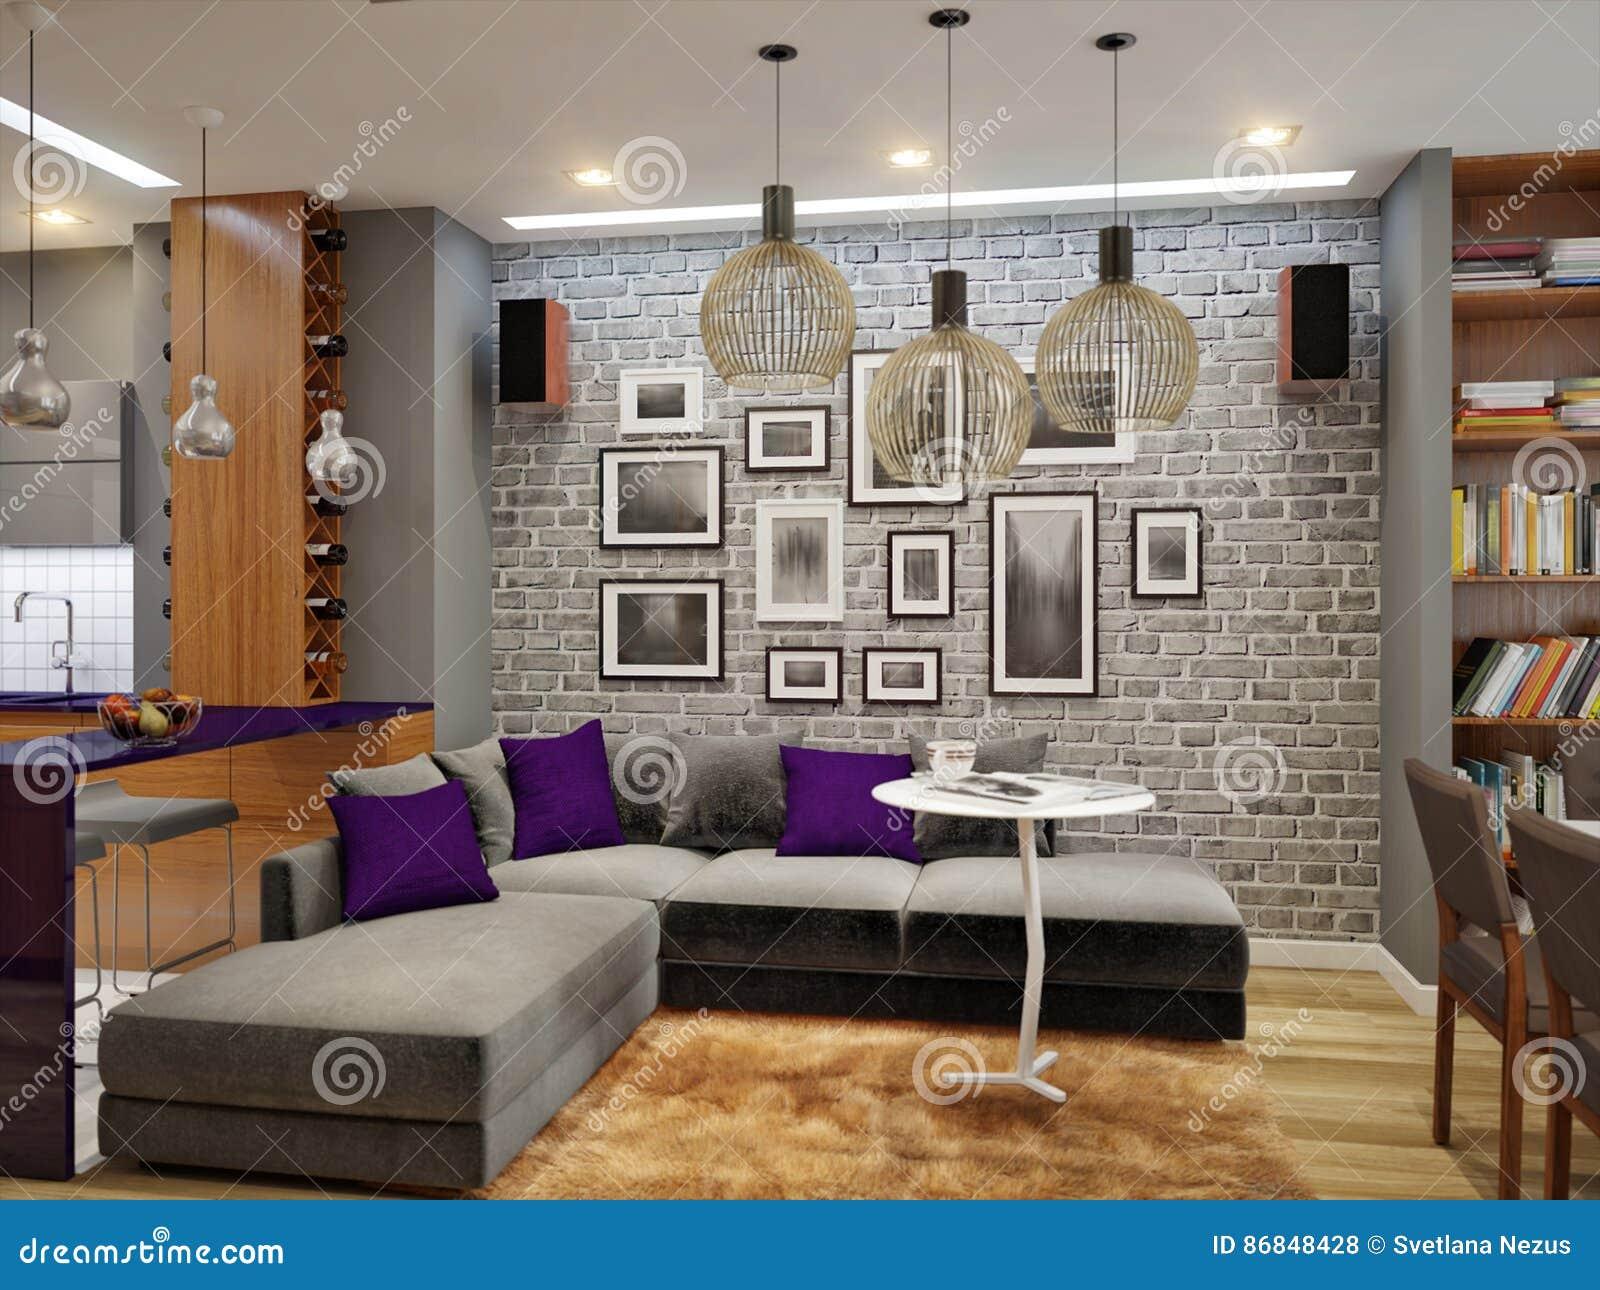 https://thumbs.dreamstime.com/z/modern-woonkamer-en-keuken-binnenlands-ontwerp-grijze-kleuren-86848428.jpg